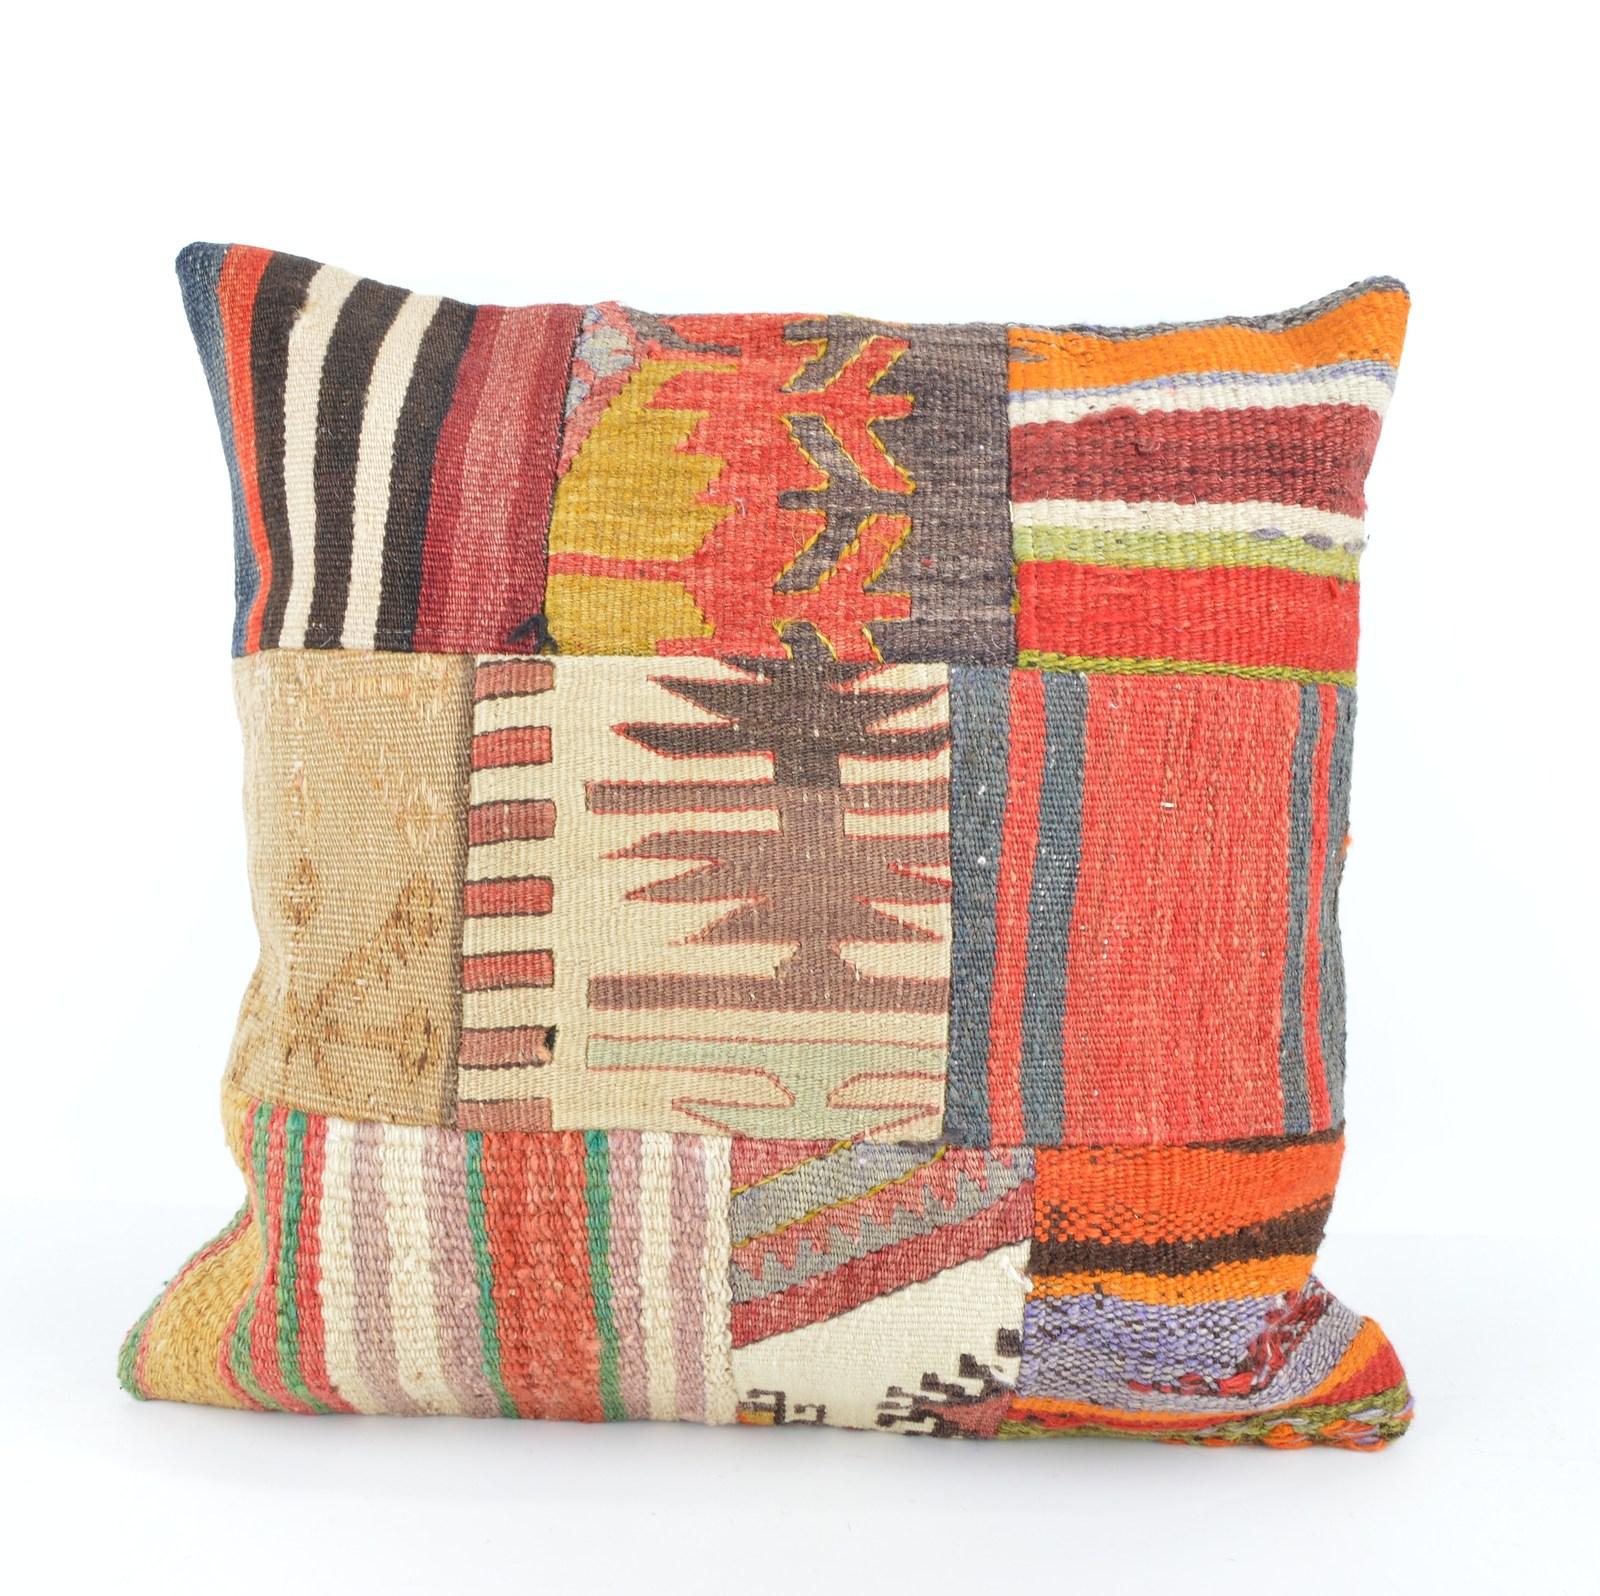 patchwork pillow kilim patchwork 18x18 inch rug patchwork patchwork kilim pillow